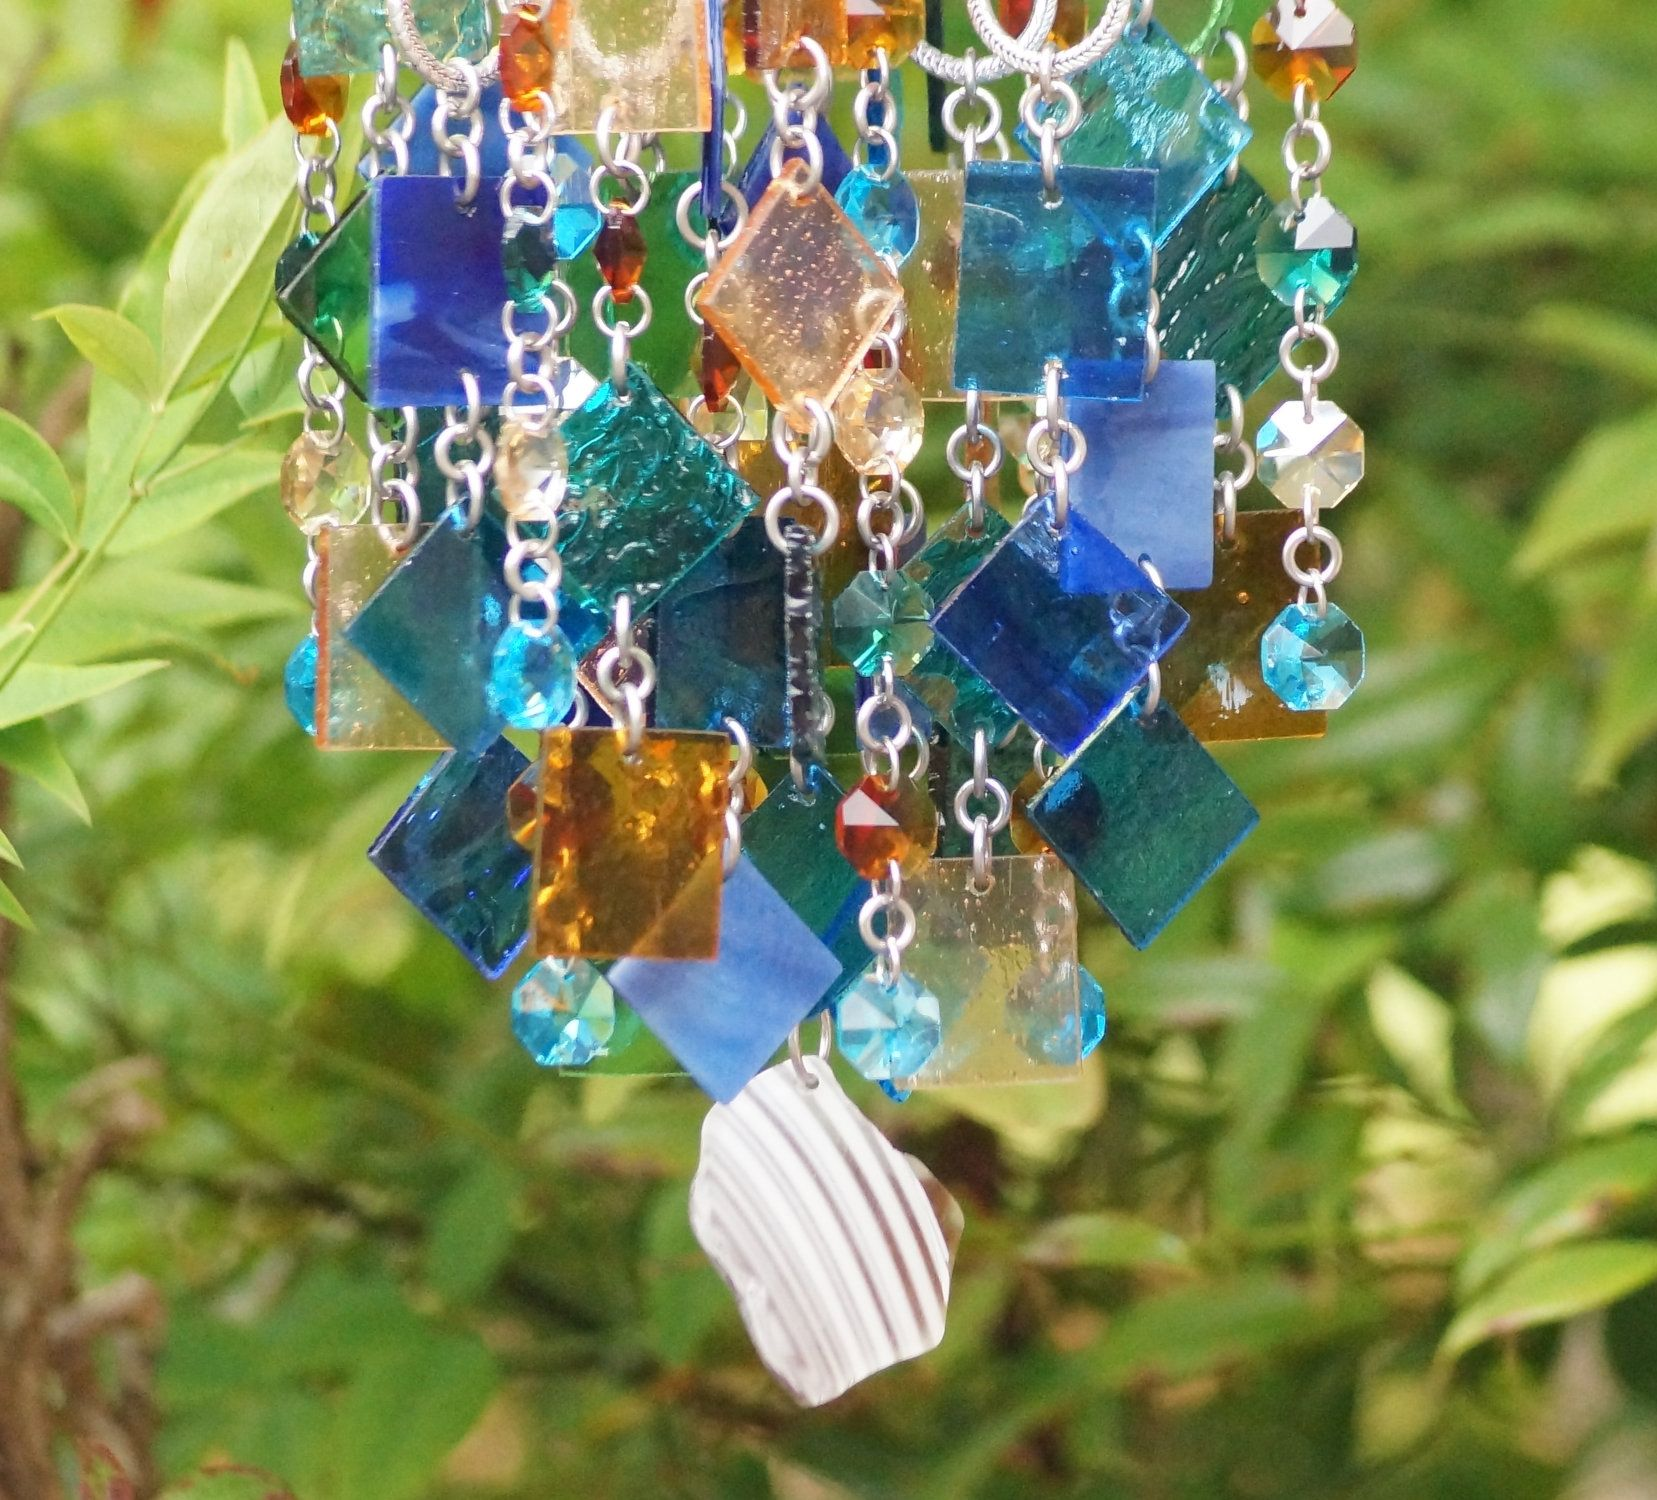 Unique Suncatcher Wind Chime Kaleidoscope OOAK Gift